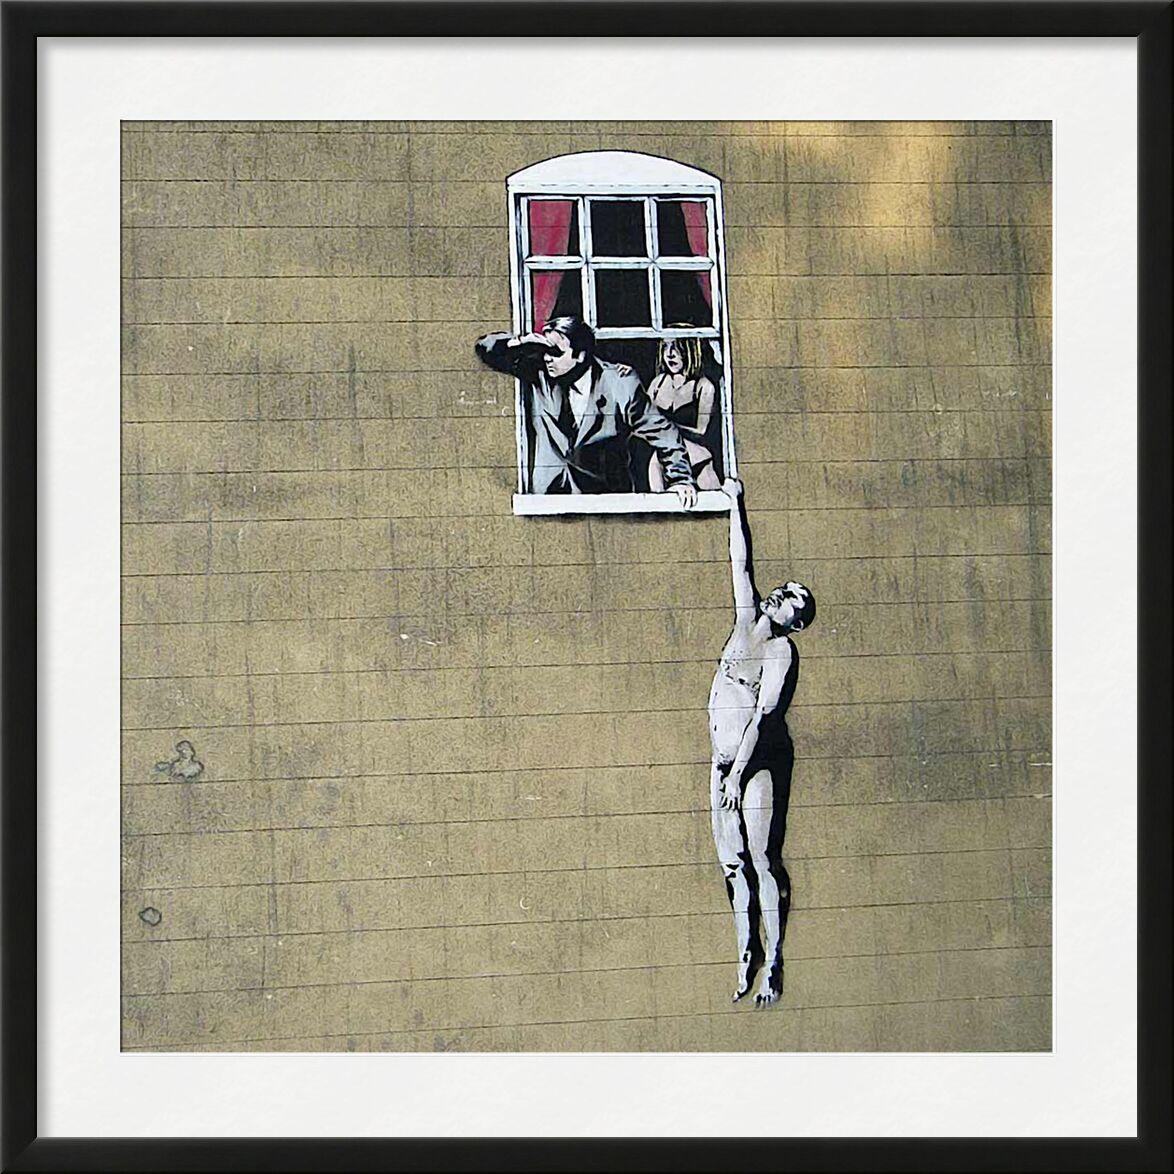 Scandal - BANKSY desde AUX BEAUX-ARTS, Prodi Art, Banksy, arte callejero, escándalo, infidelidad